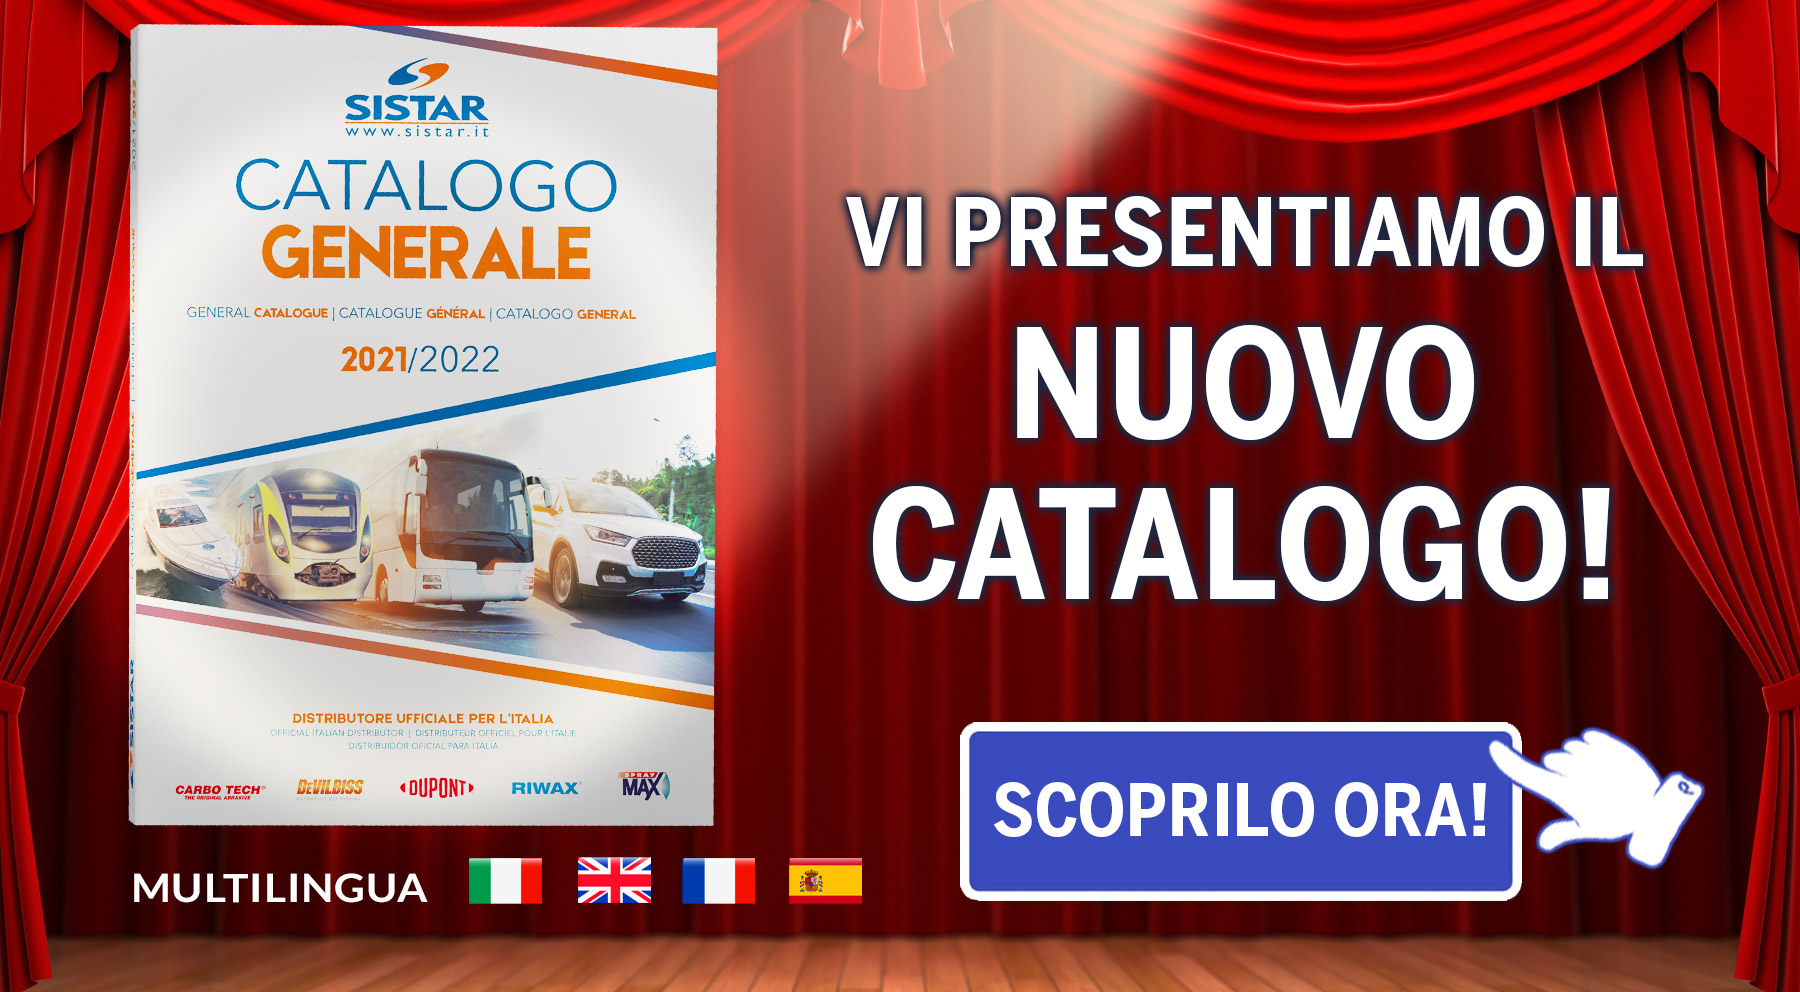 BANNER-1800pxl-catalogo2021-2022